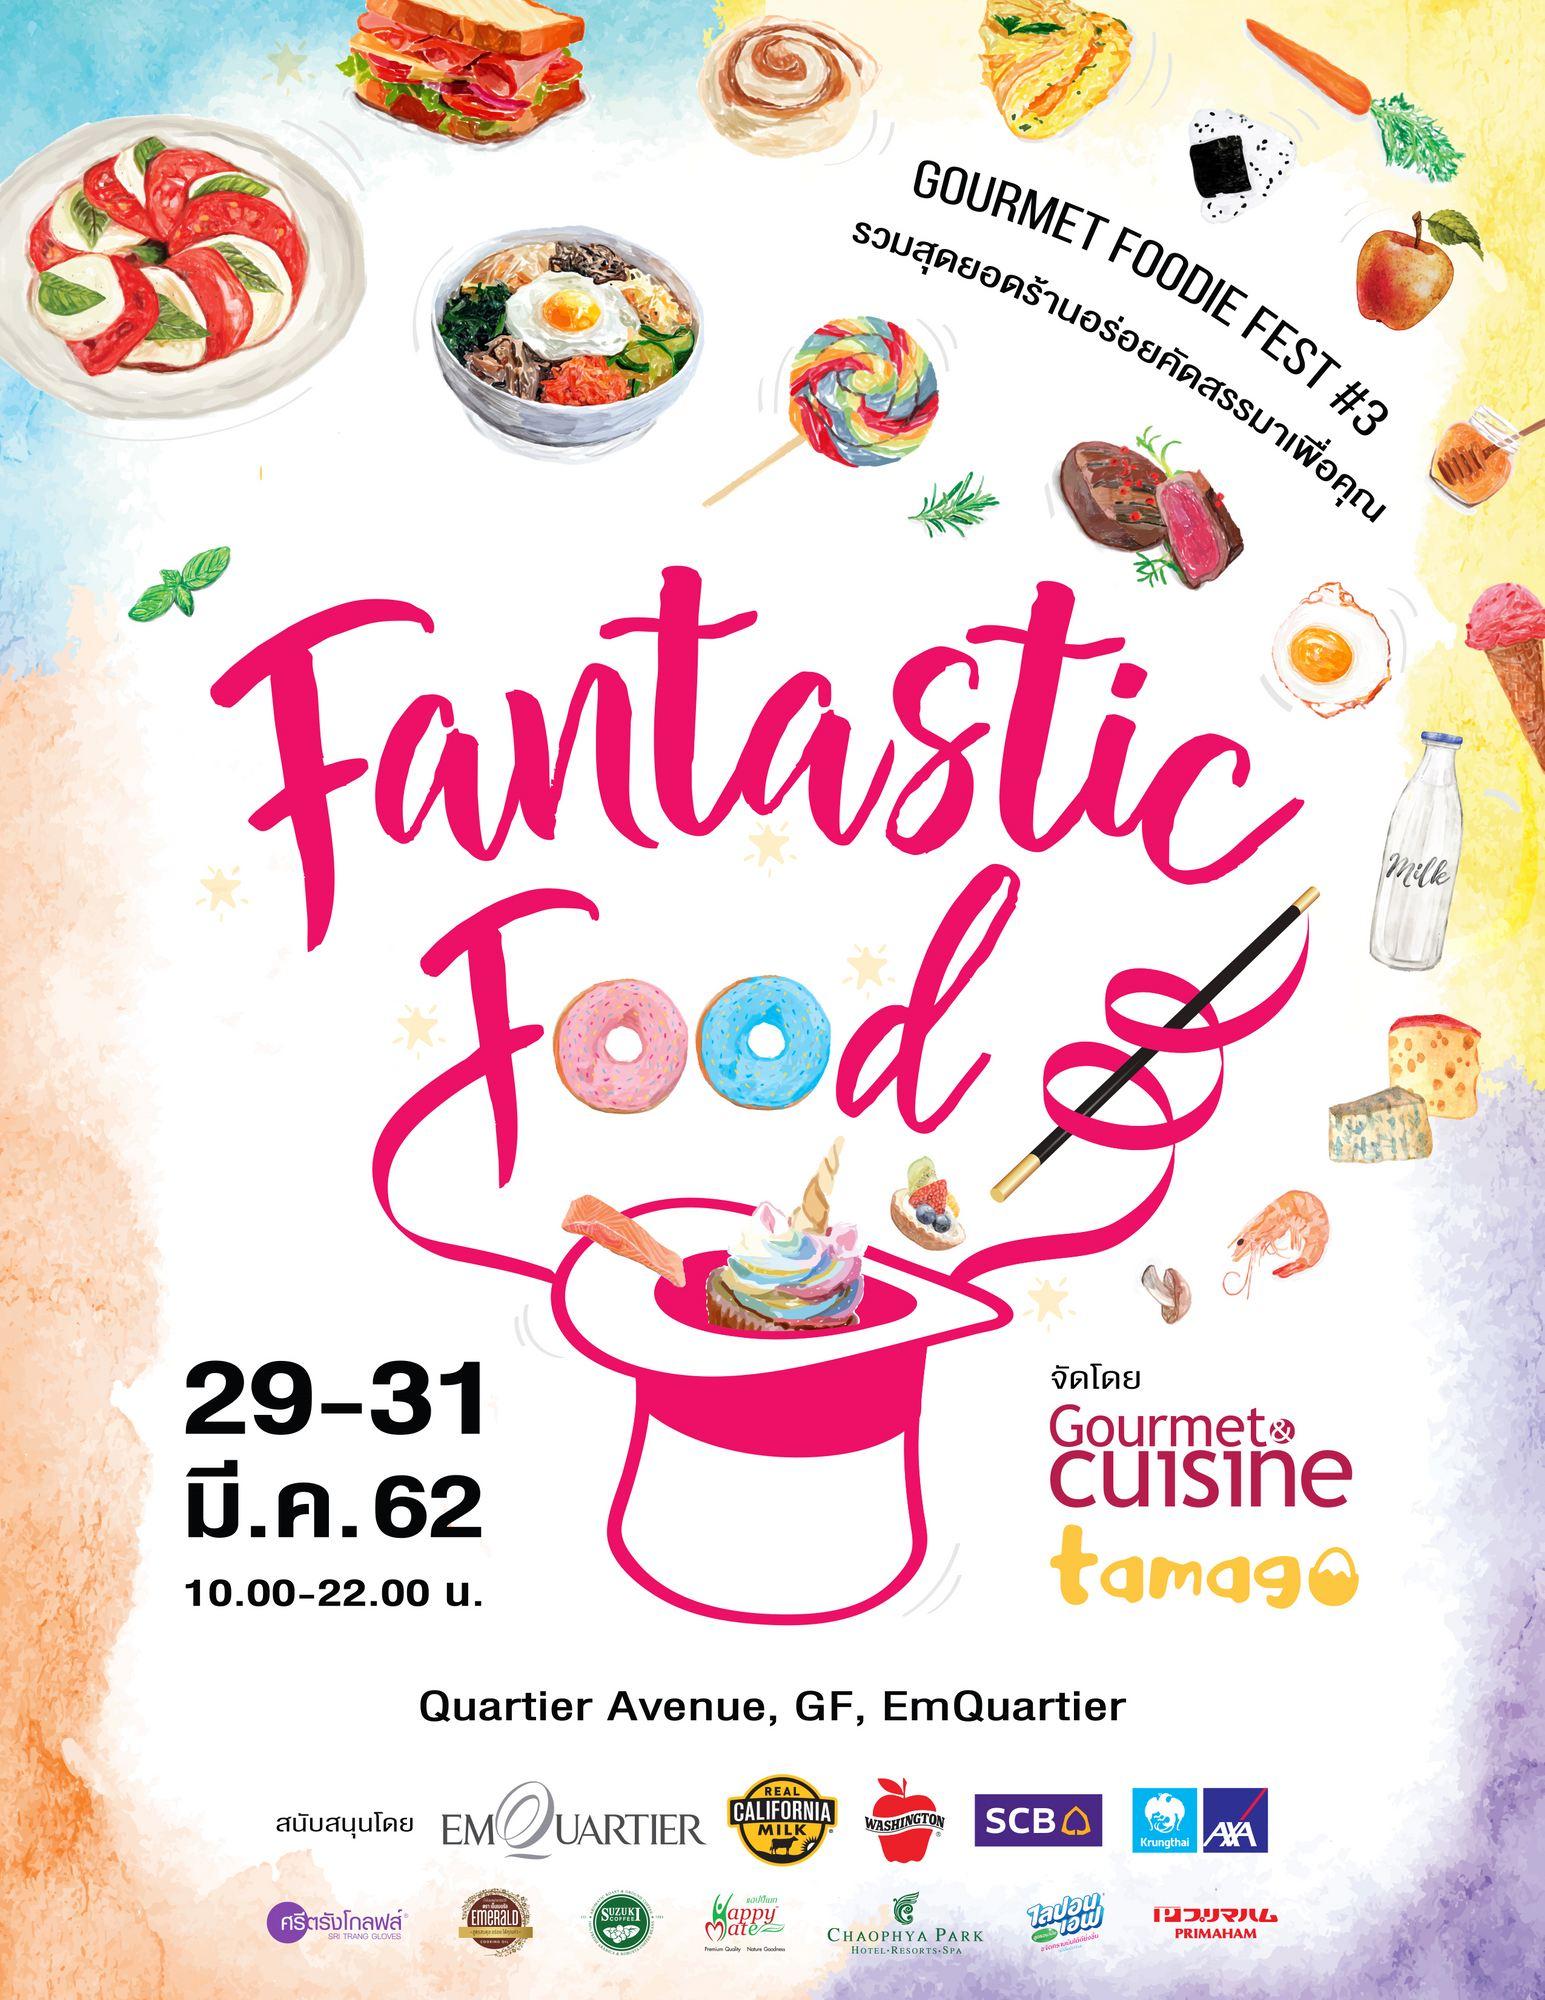 Gourmet Foodie Fest ครั้งที่ 3